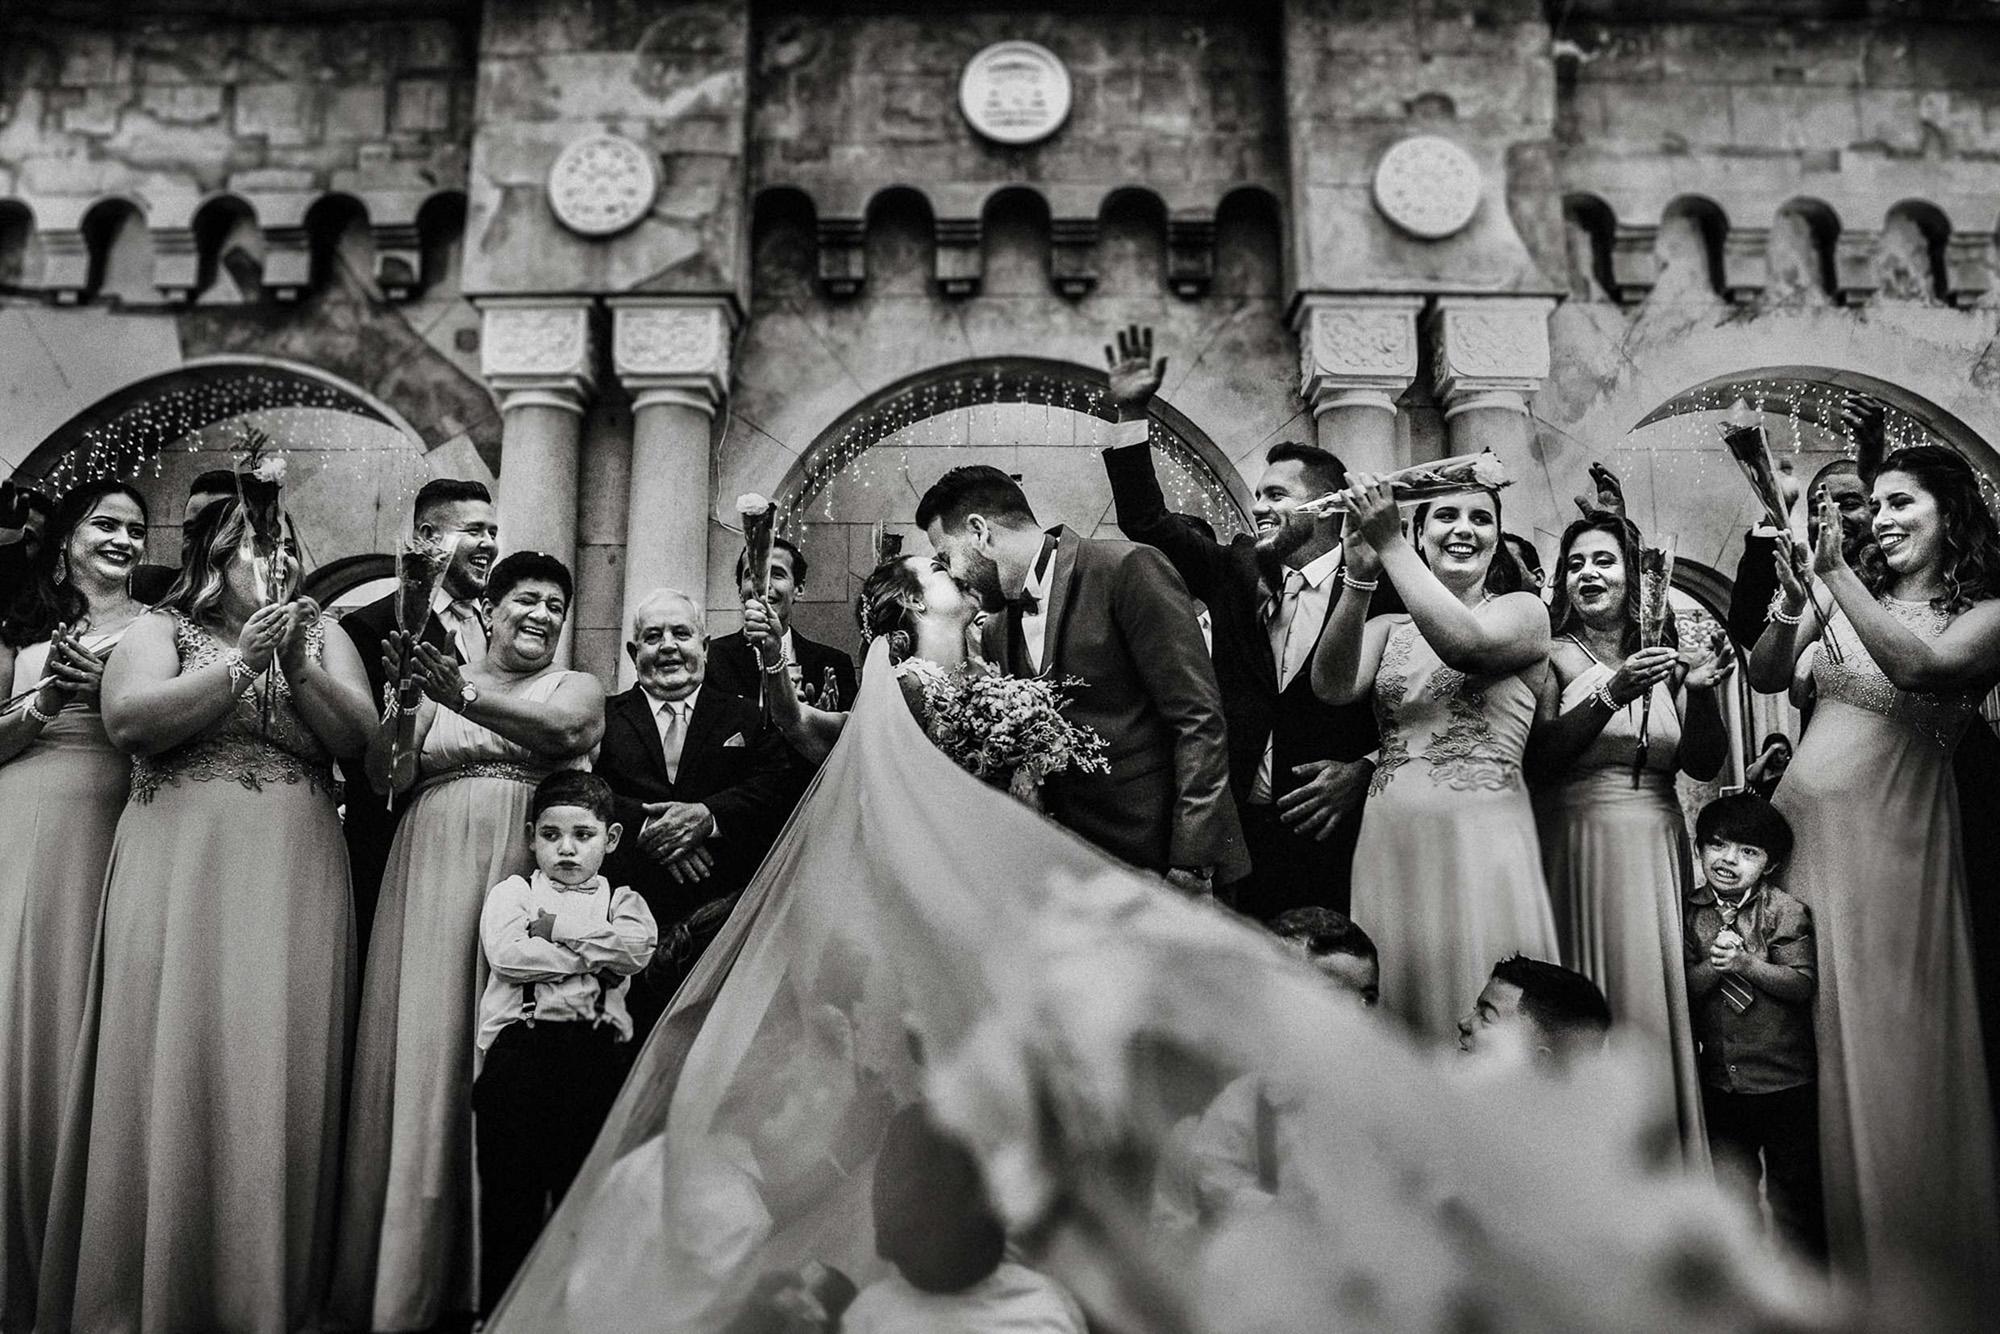 guests-clap-children-play-under-veil-area-da-fotografia-portugal-photographers